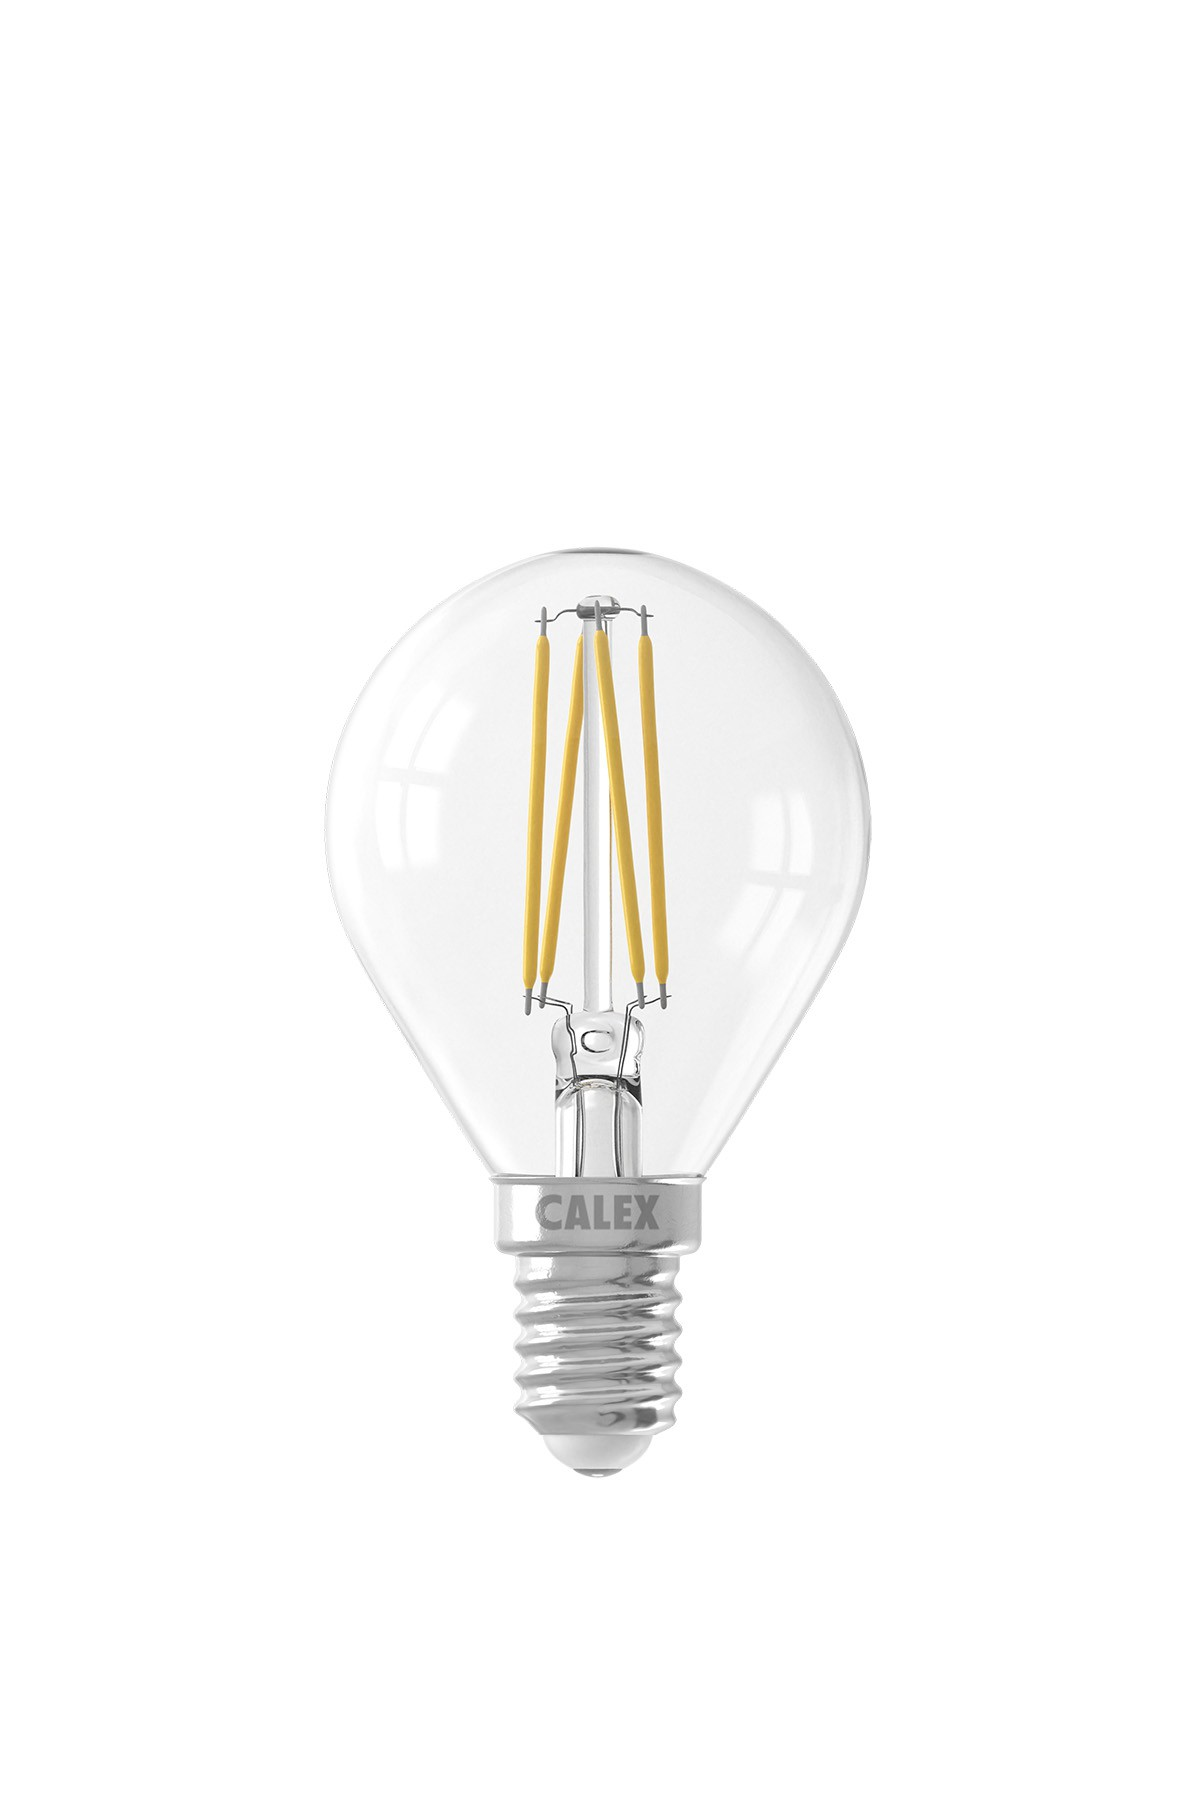 filament-led-dimmable-spherical-lamps-240v-3-5w Wunderbar Led Lampen E14 Dekorationen